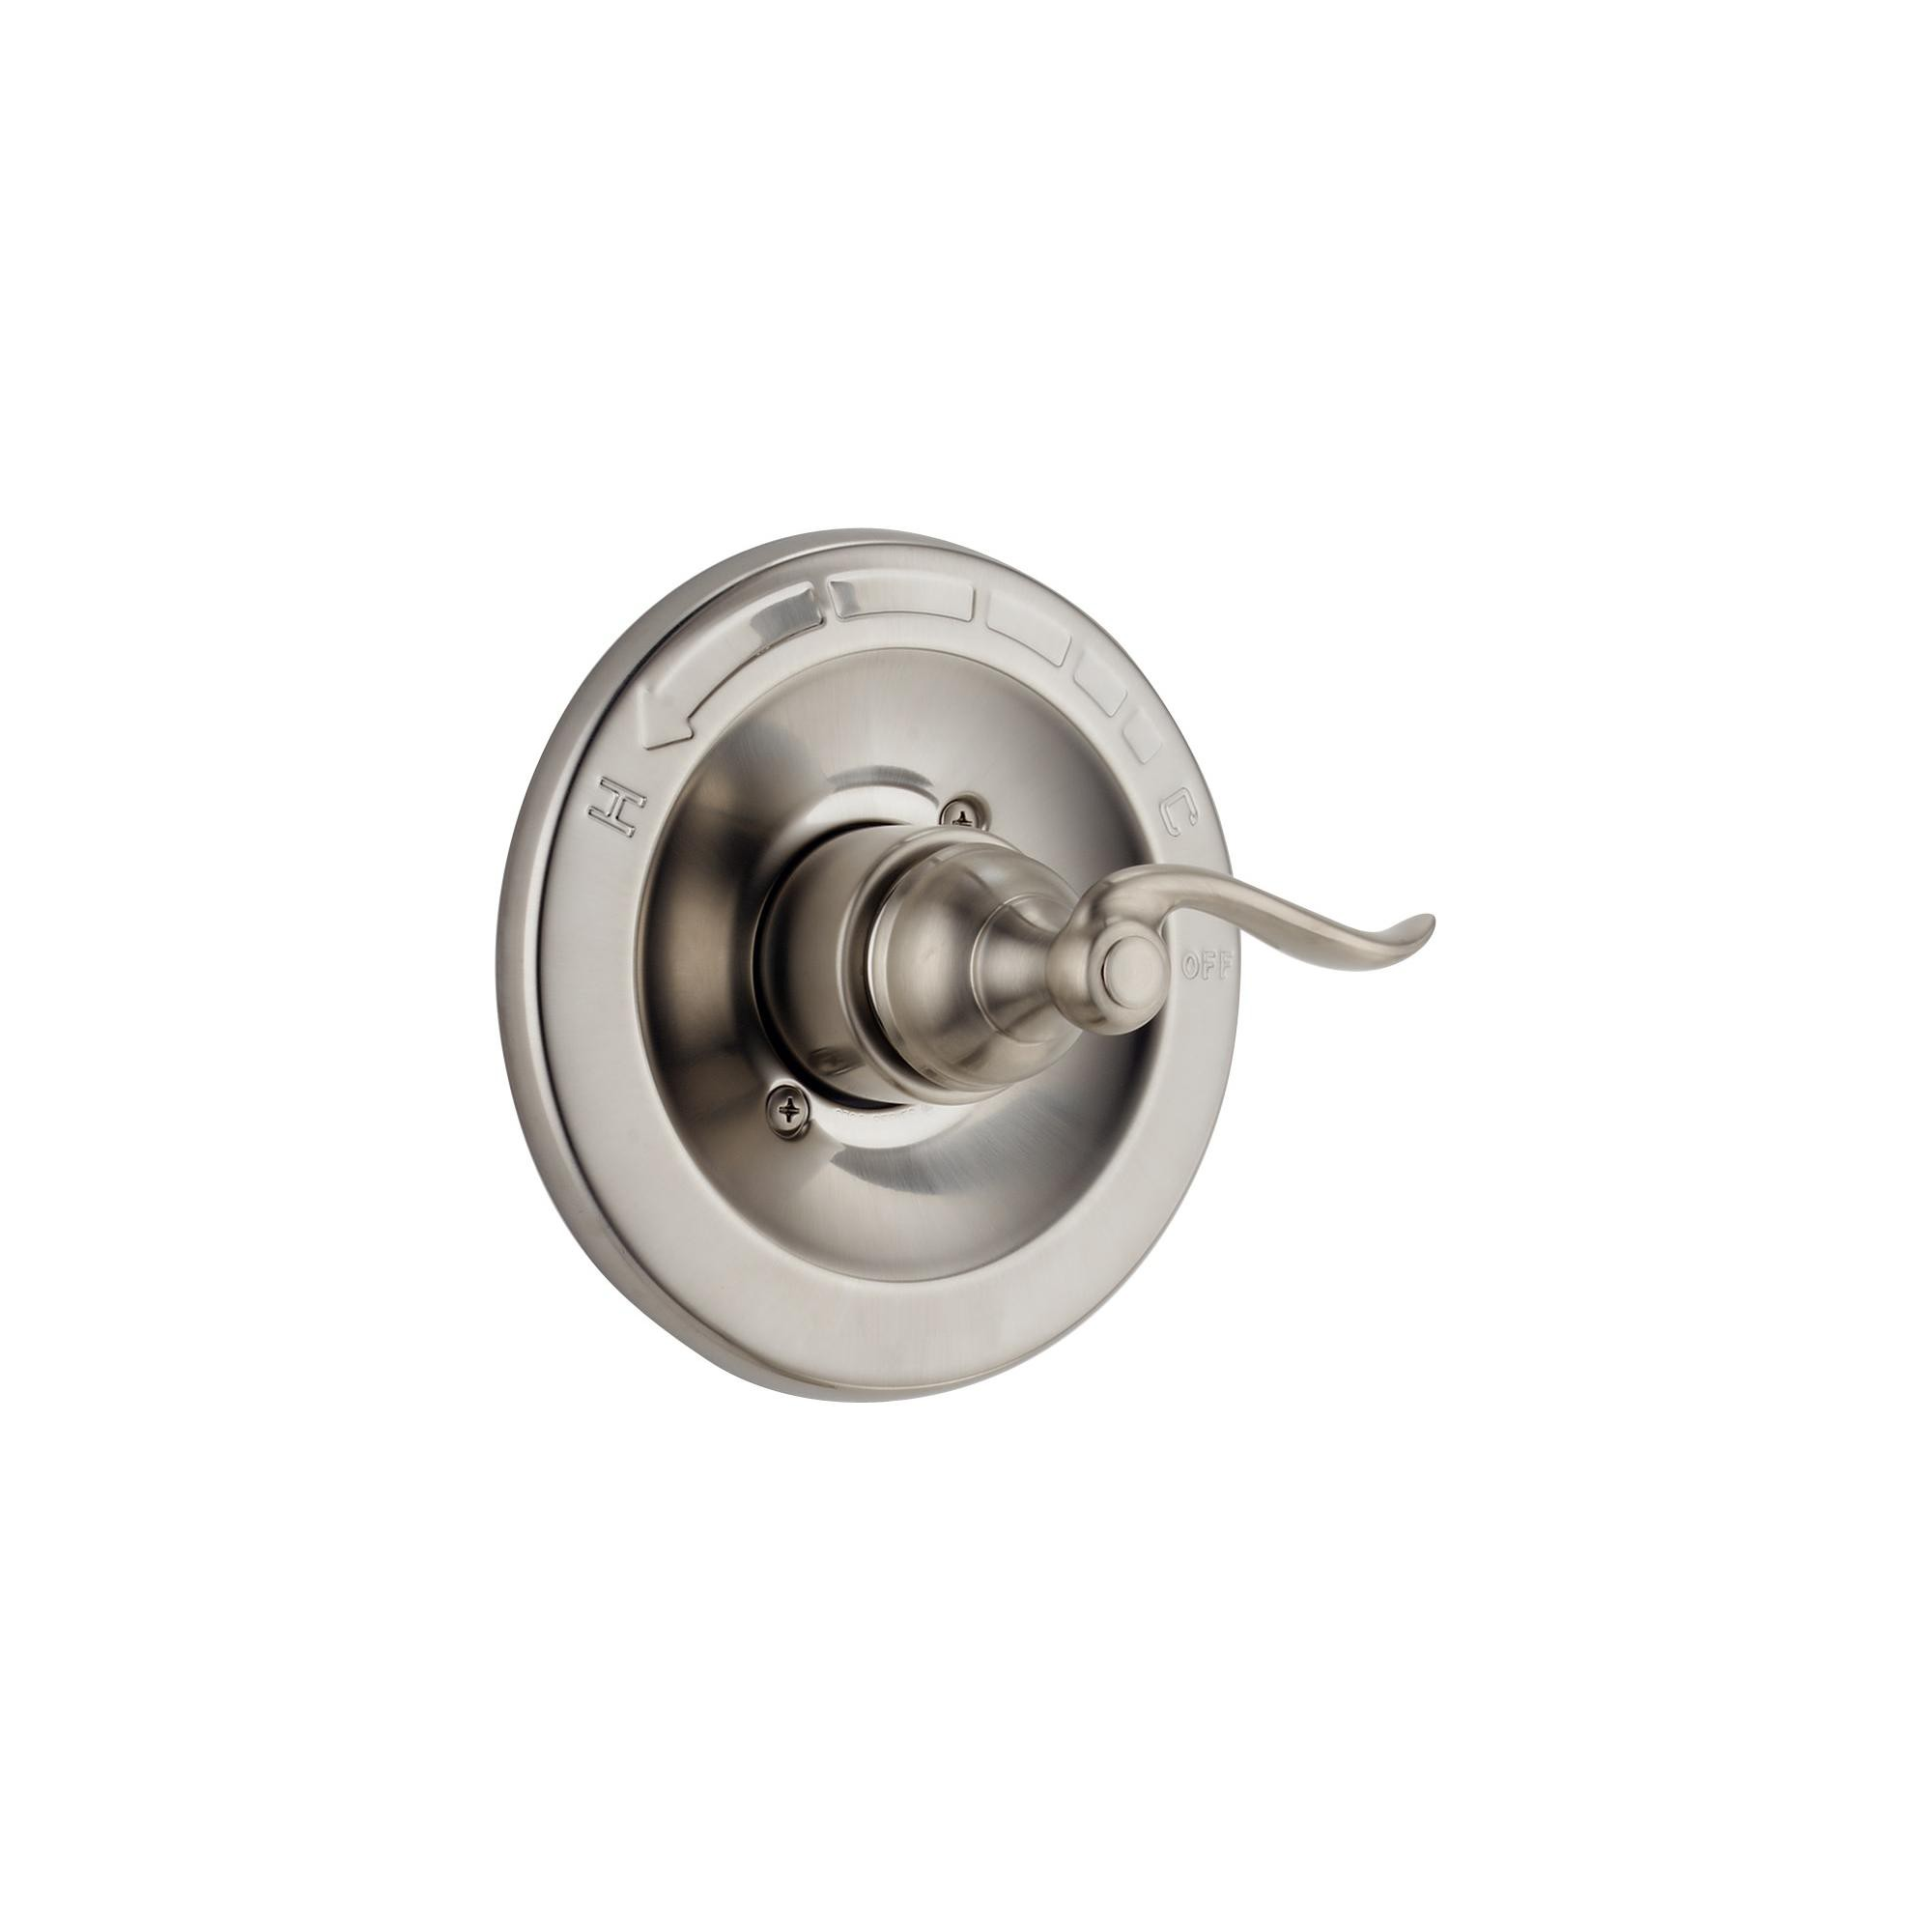 Delta Faucet Bt14096 Windemere Pressure Balanced Mixing Valve Trim